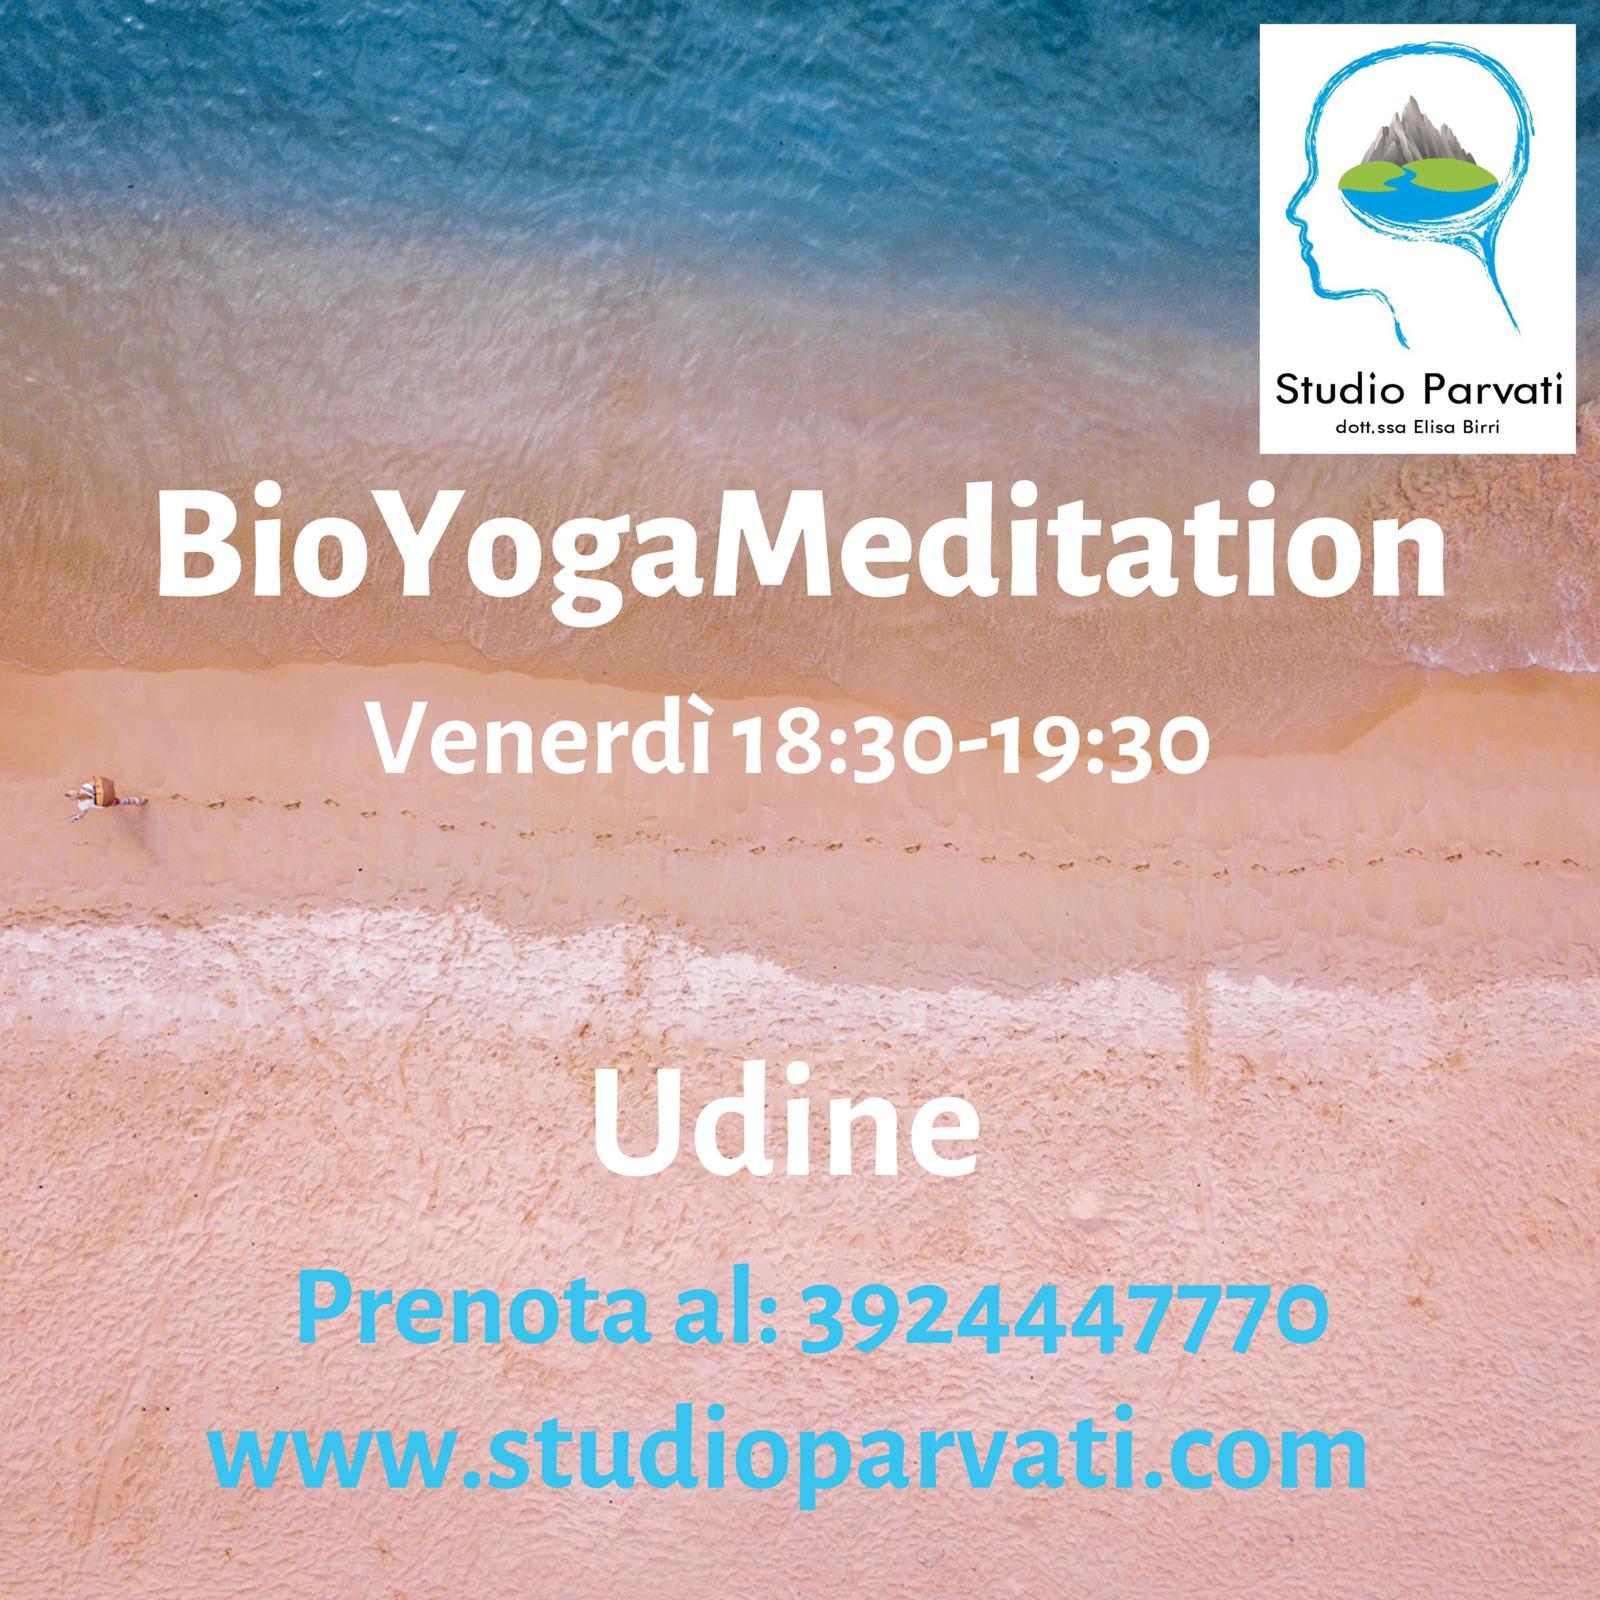 BioYogaMeditation a Udine